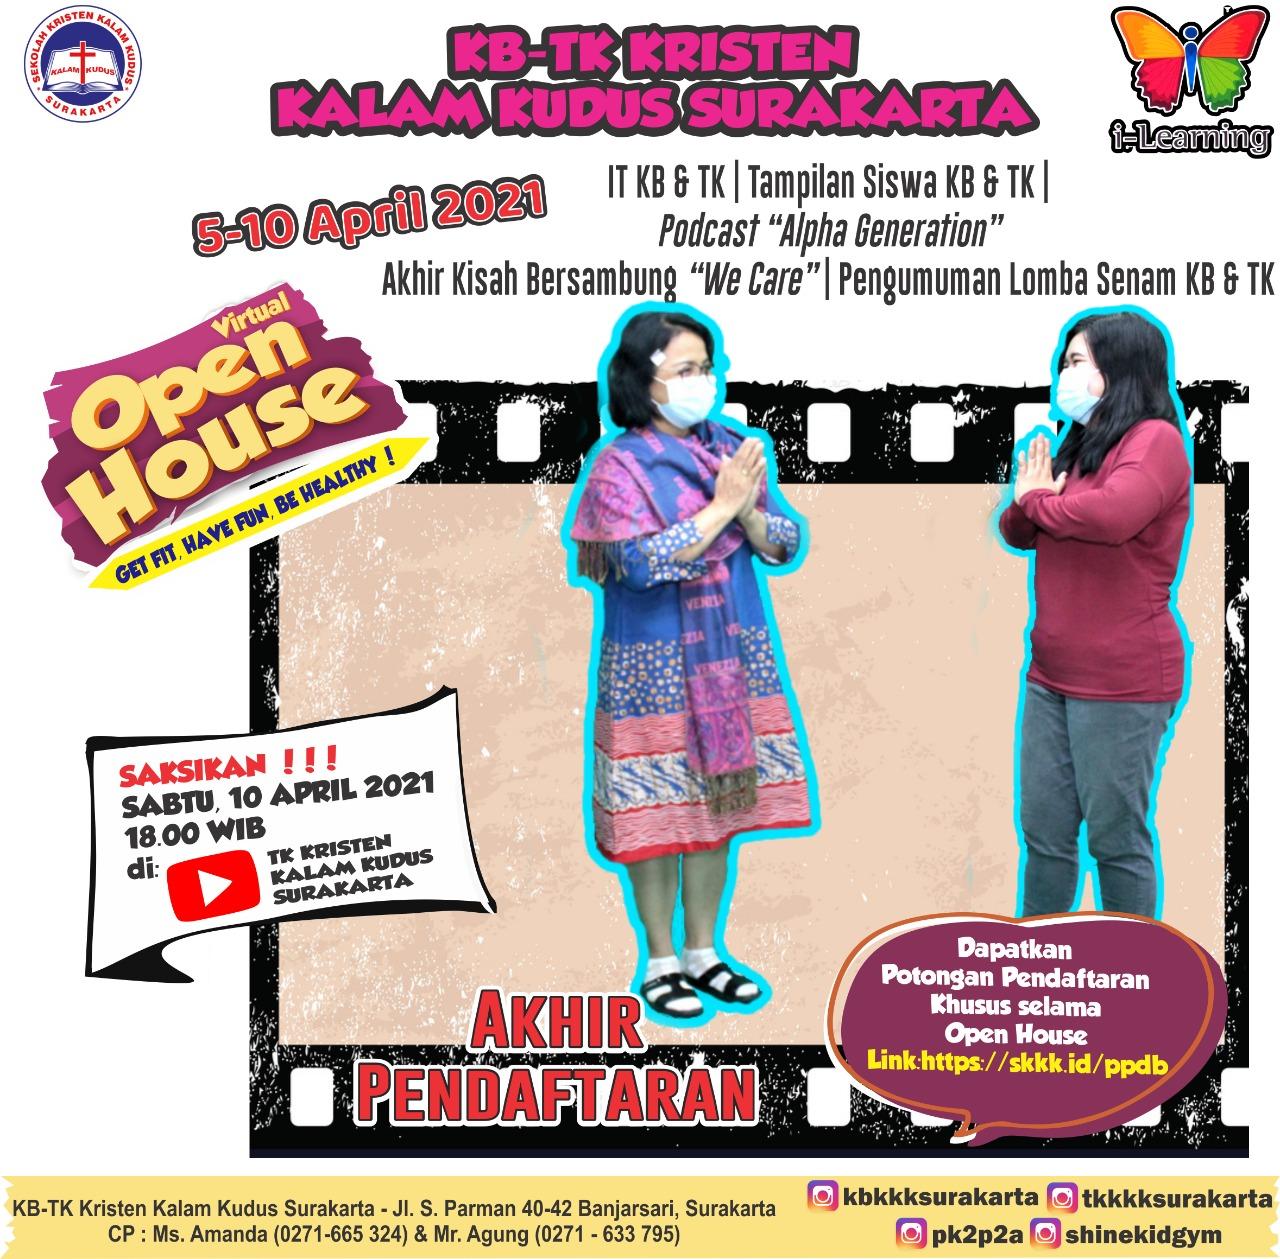 Virtual Open House KB-TK Kristen Kalam Kudus Surakarta - 10 April 2021